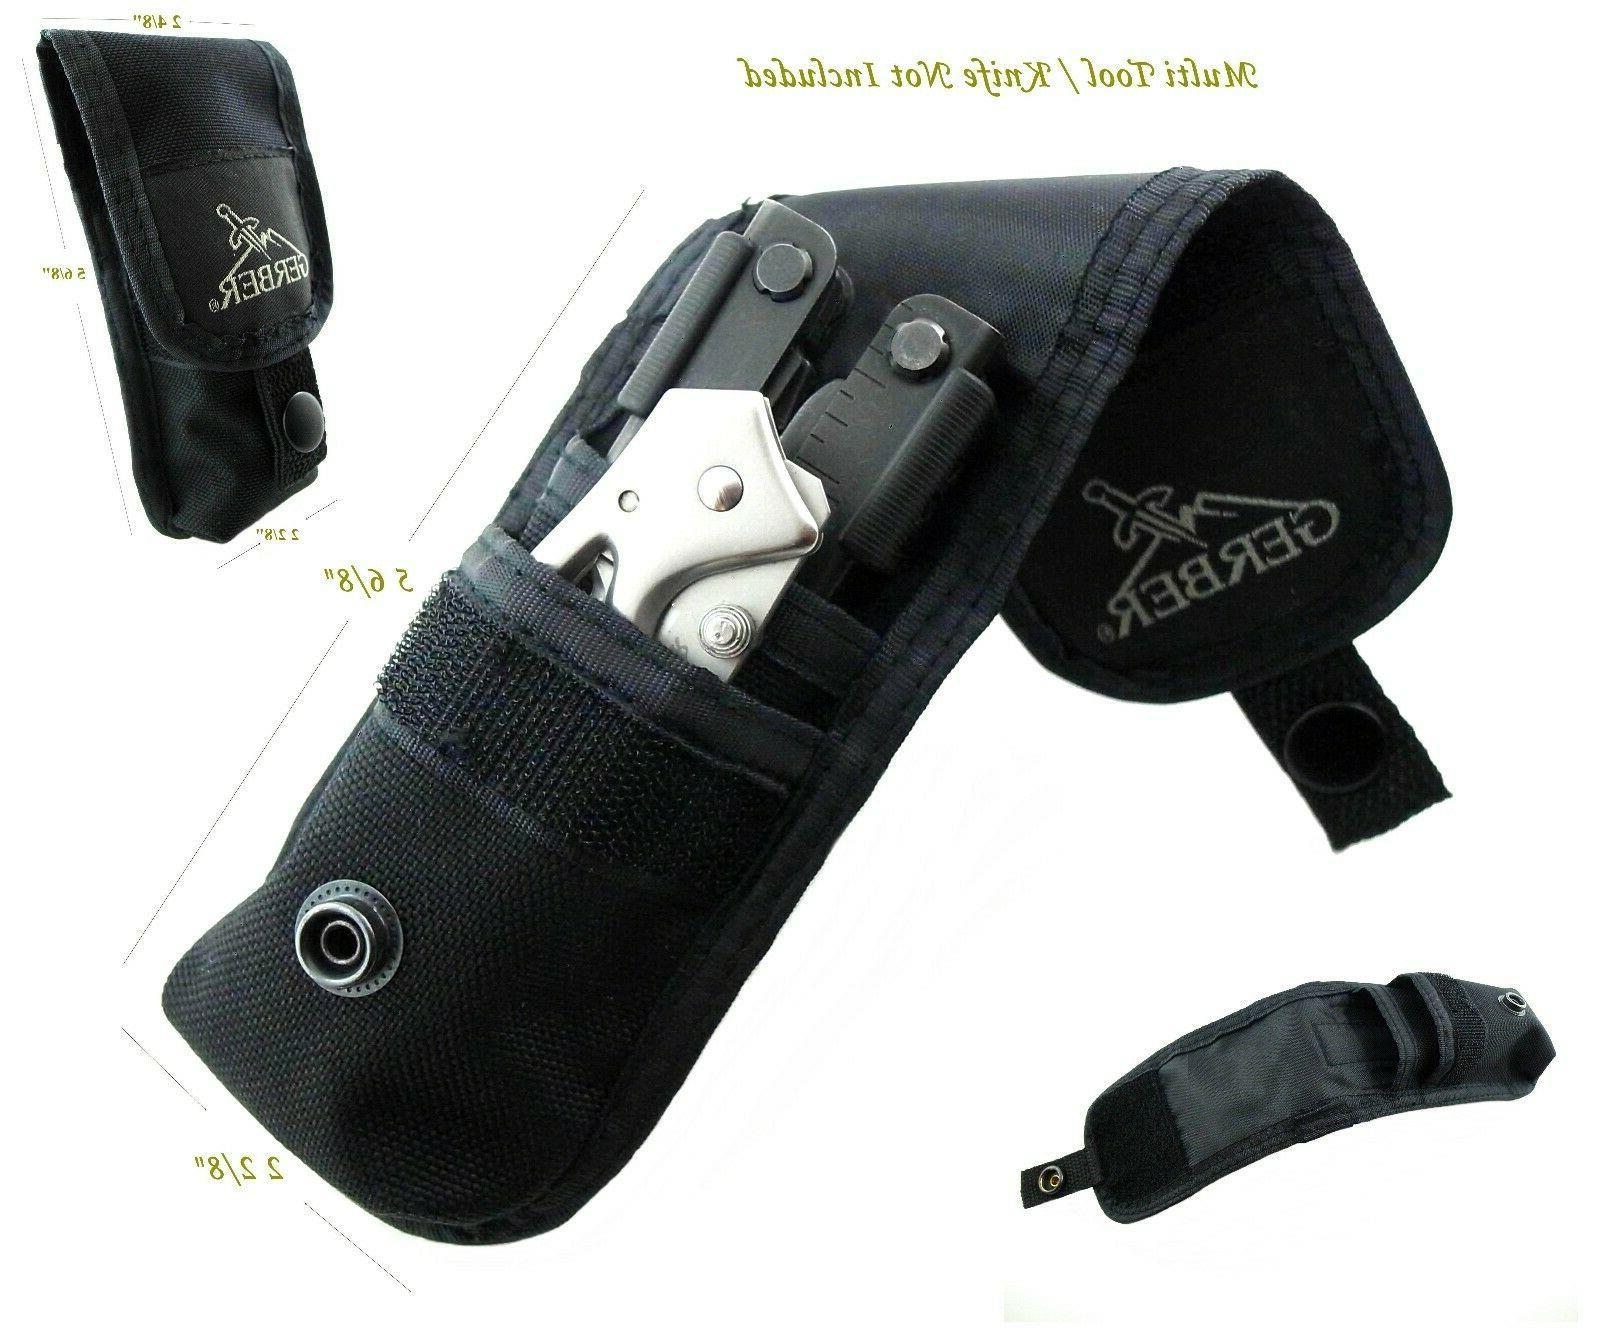 & POUCH/SHEATH FOR MP800, NR